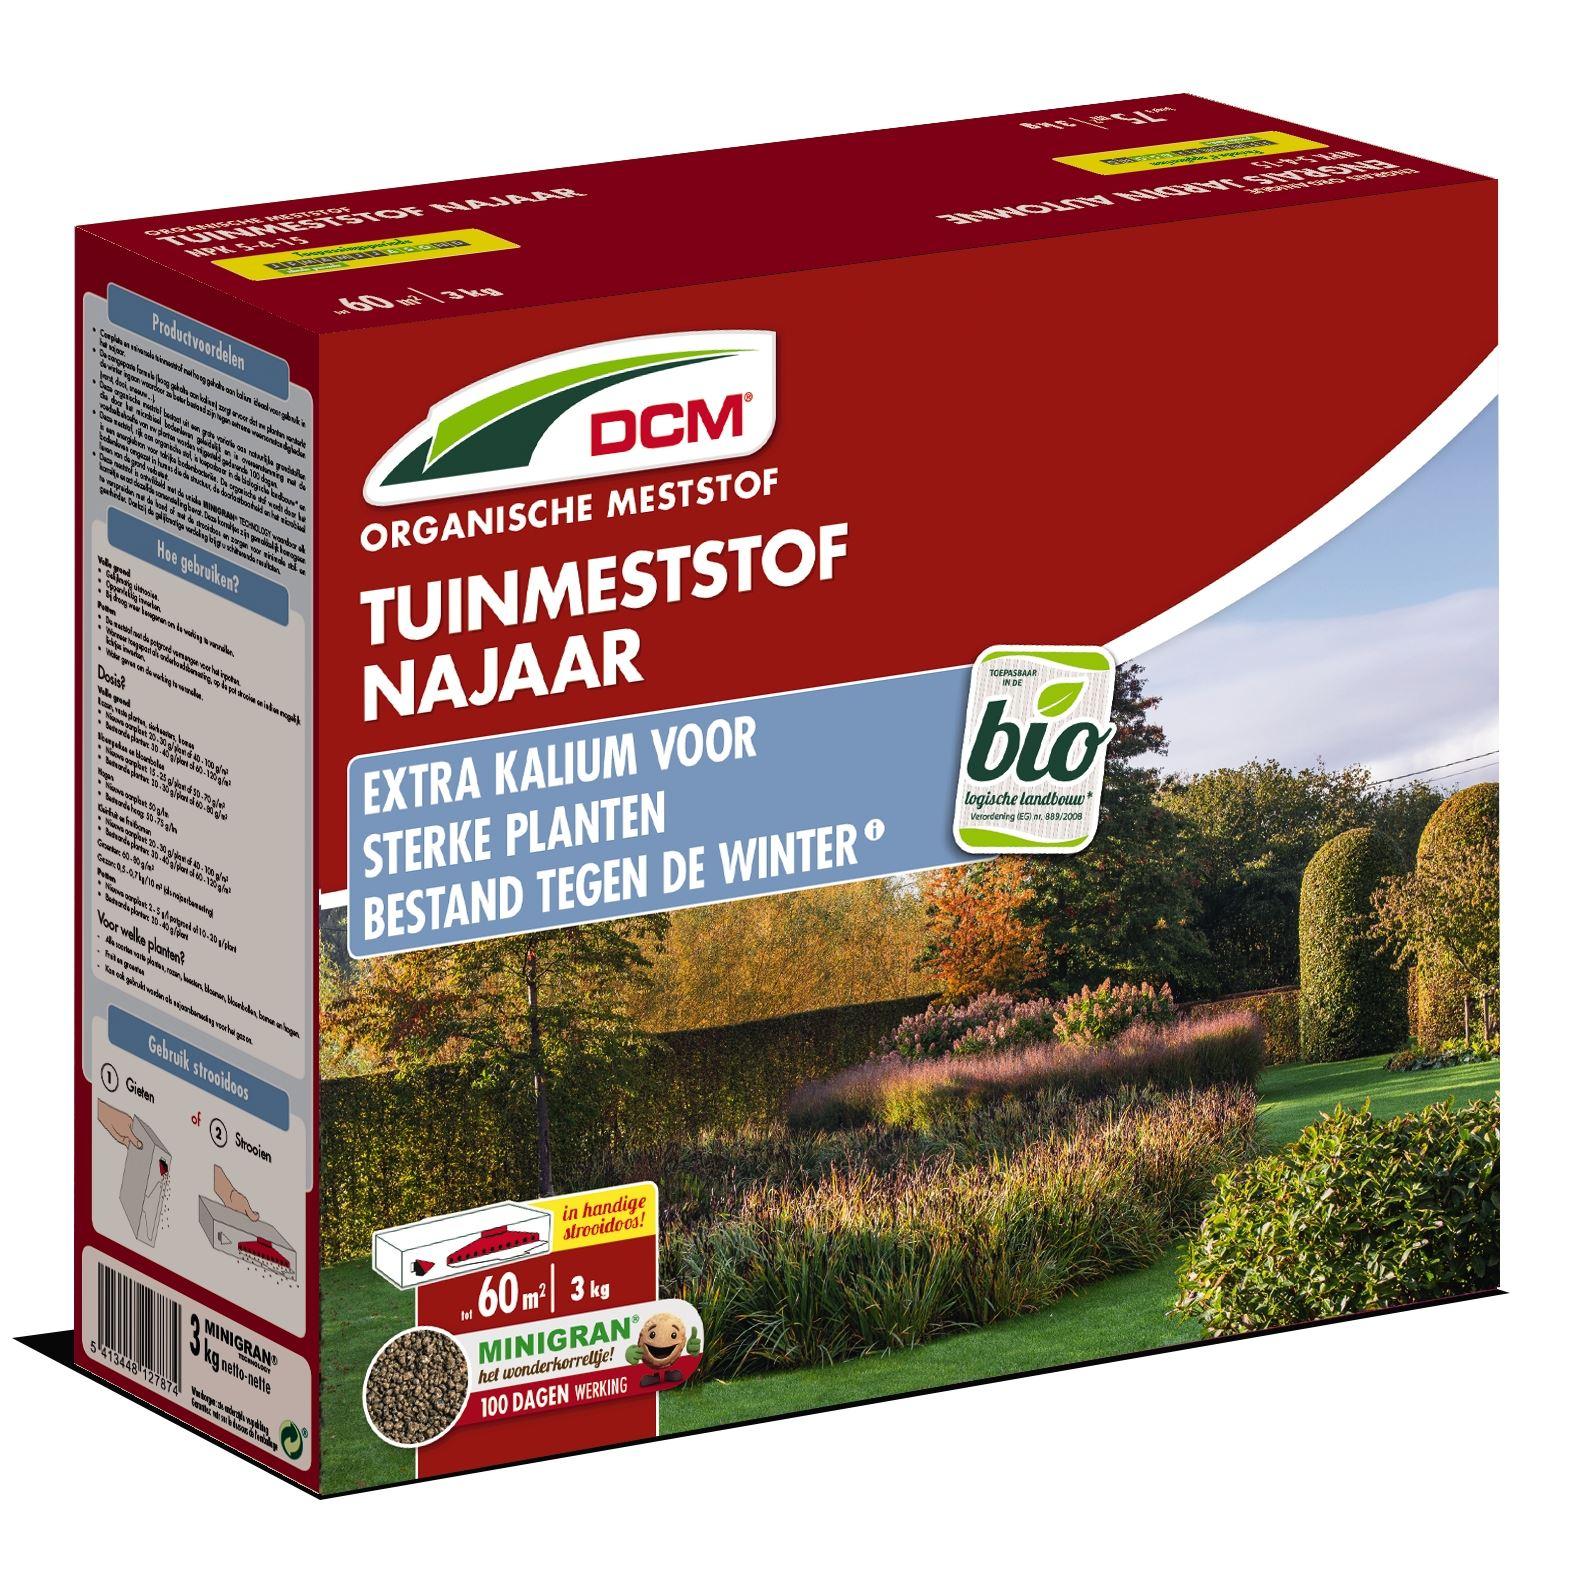 Universele-tuinmeststof-voor-het-najaar-met-extra-kalium-3kg-Bio-NPK-5-4-15